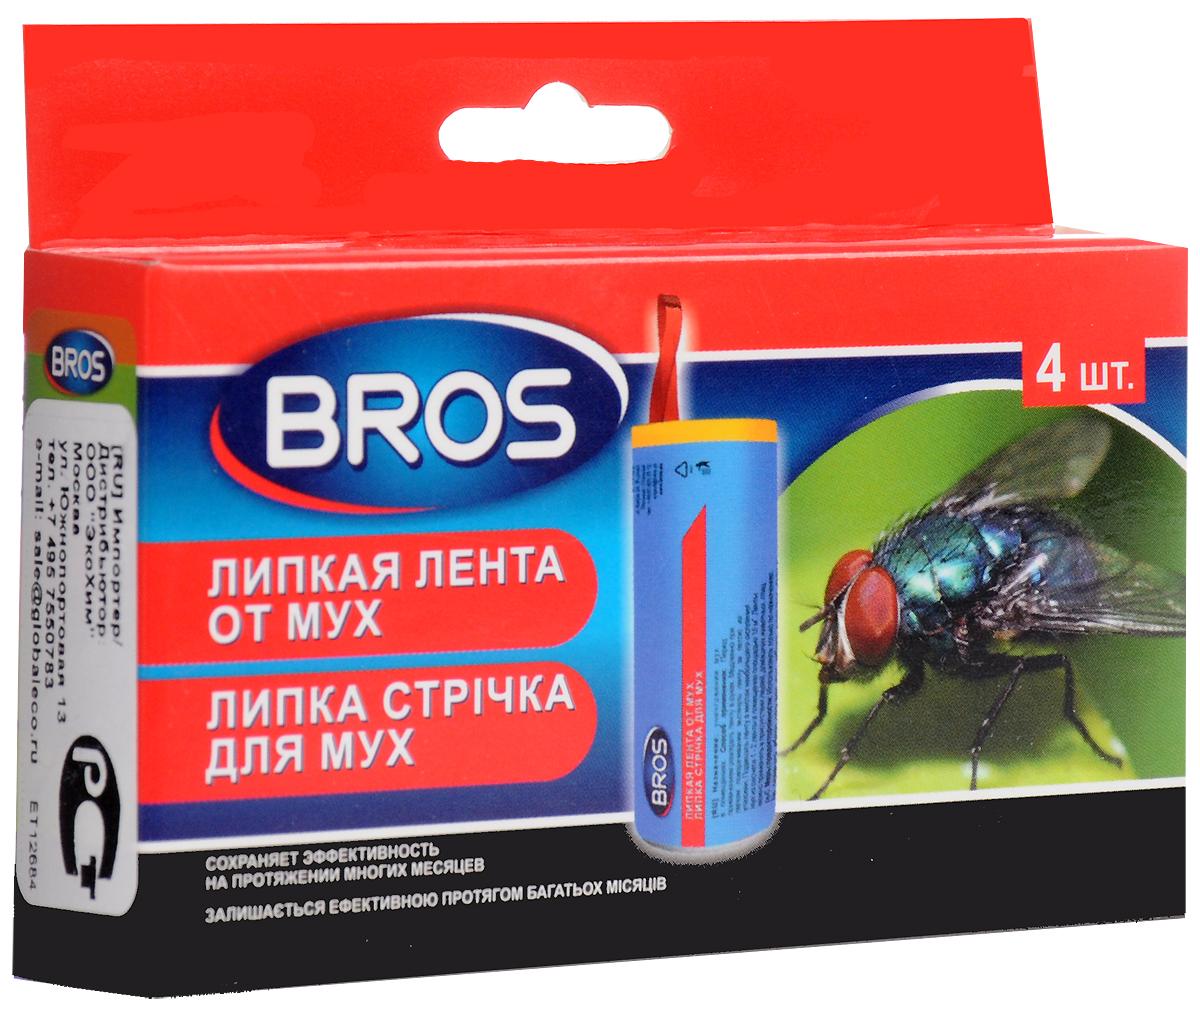 Лента липкая от мух Bros, 4 шт лента липкая от мух bros 4 шт